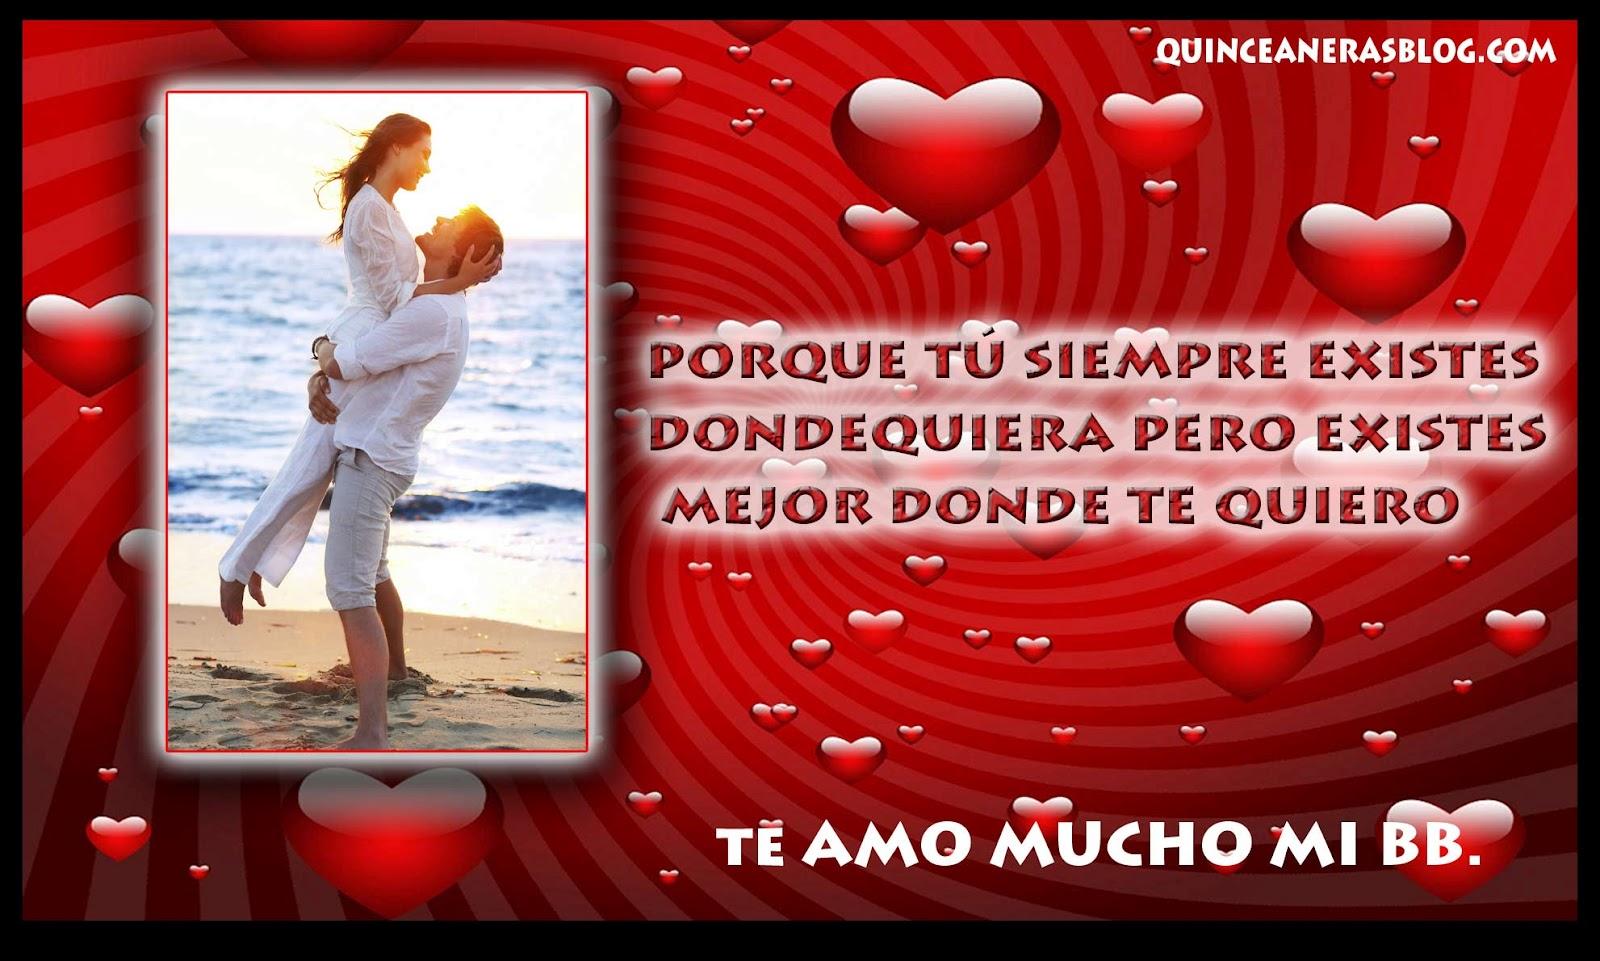 Imagenes Para Facebook Gratis: Todo Msn Chat: Imagenes Para Facebook De Amor Con Frases